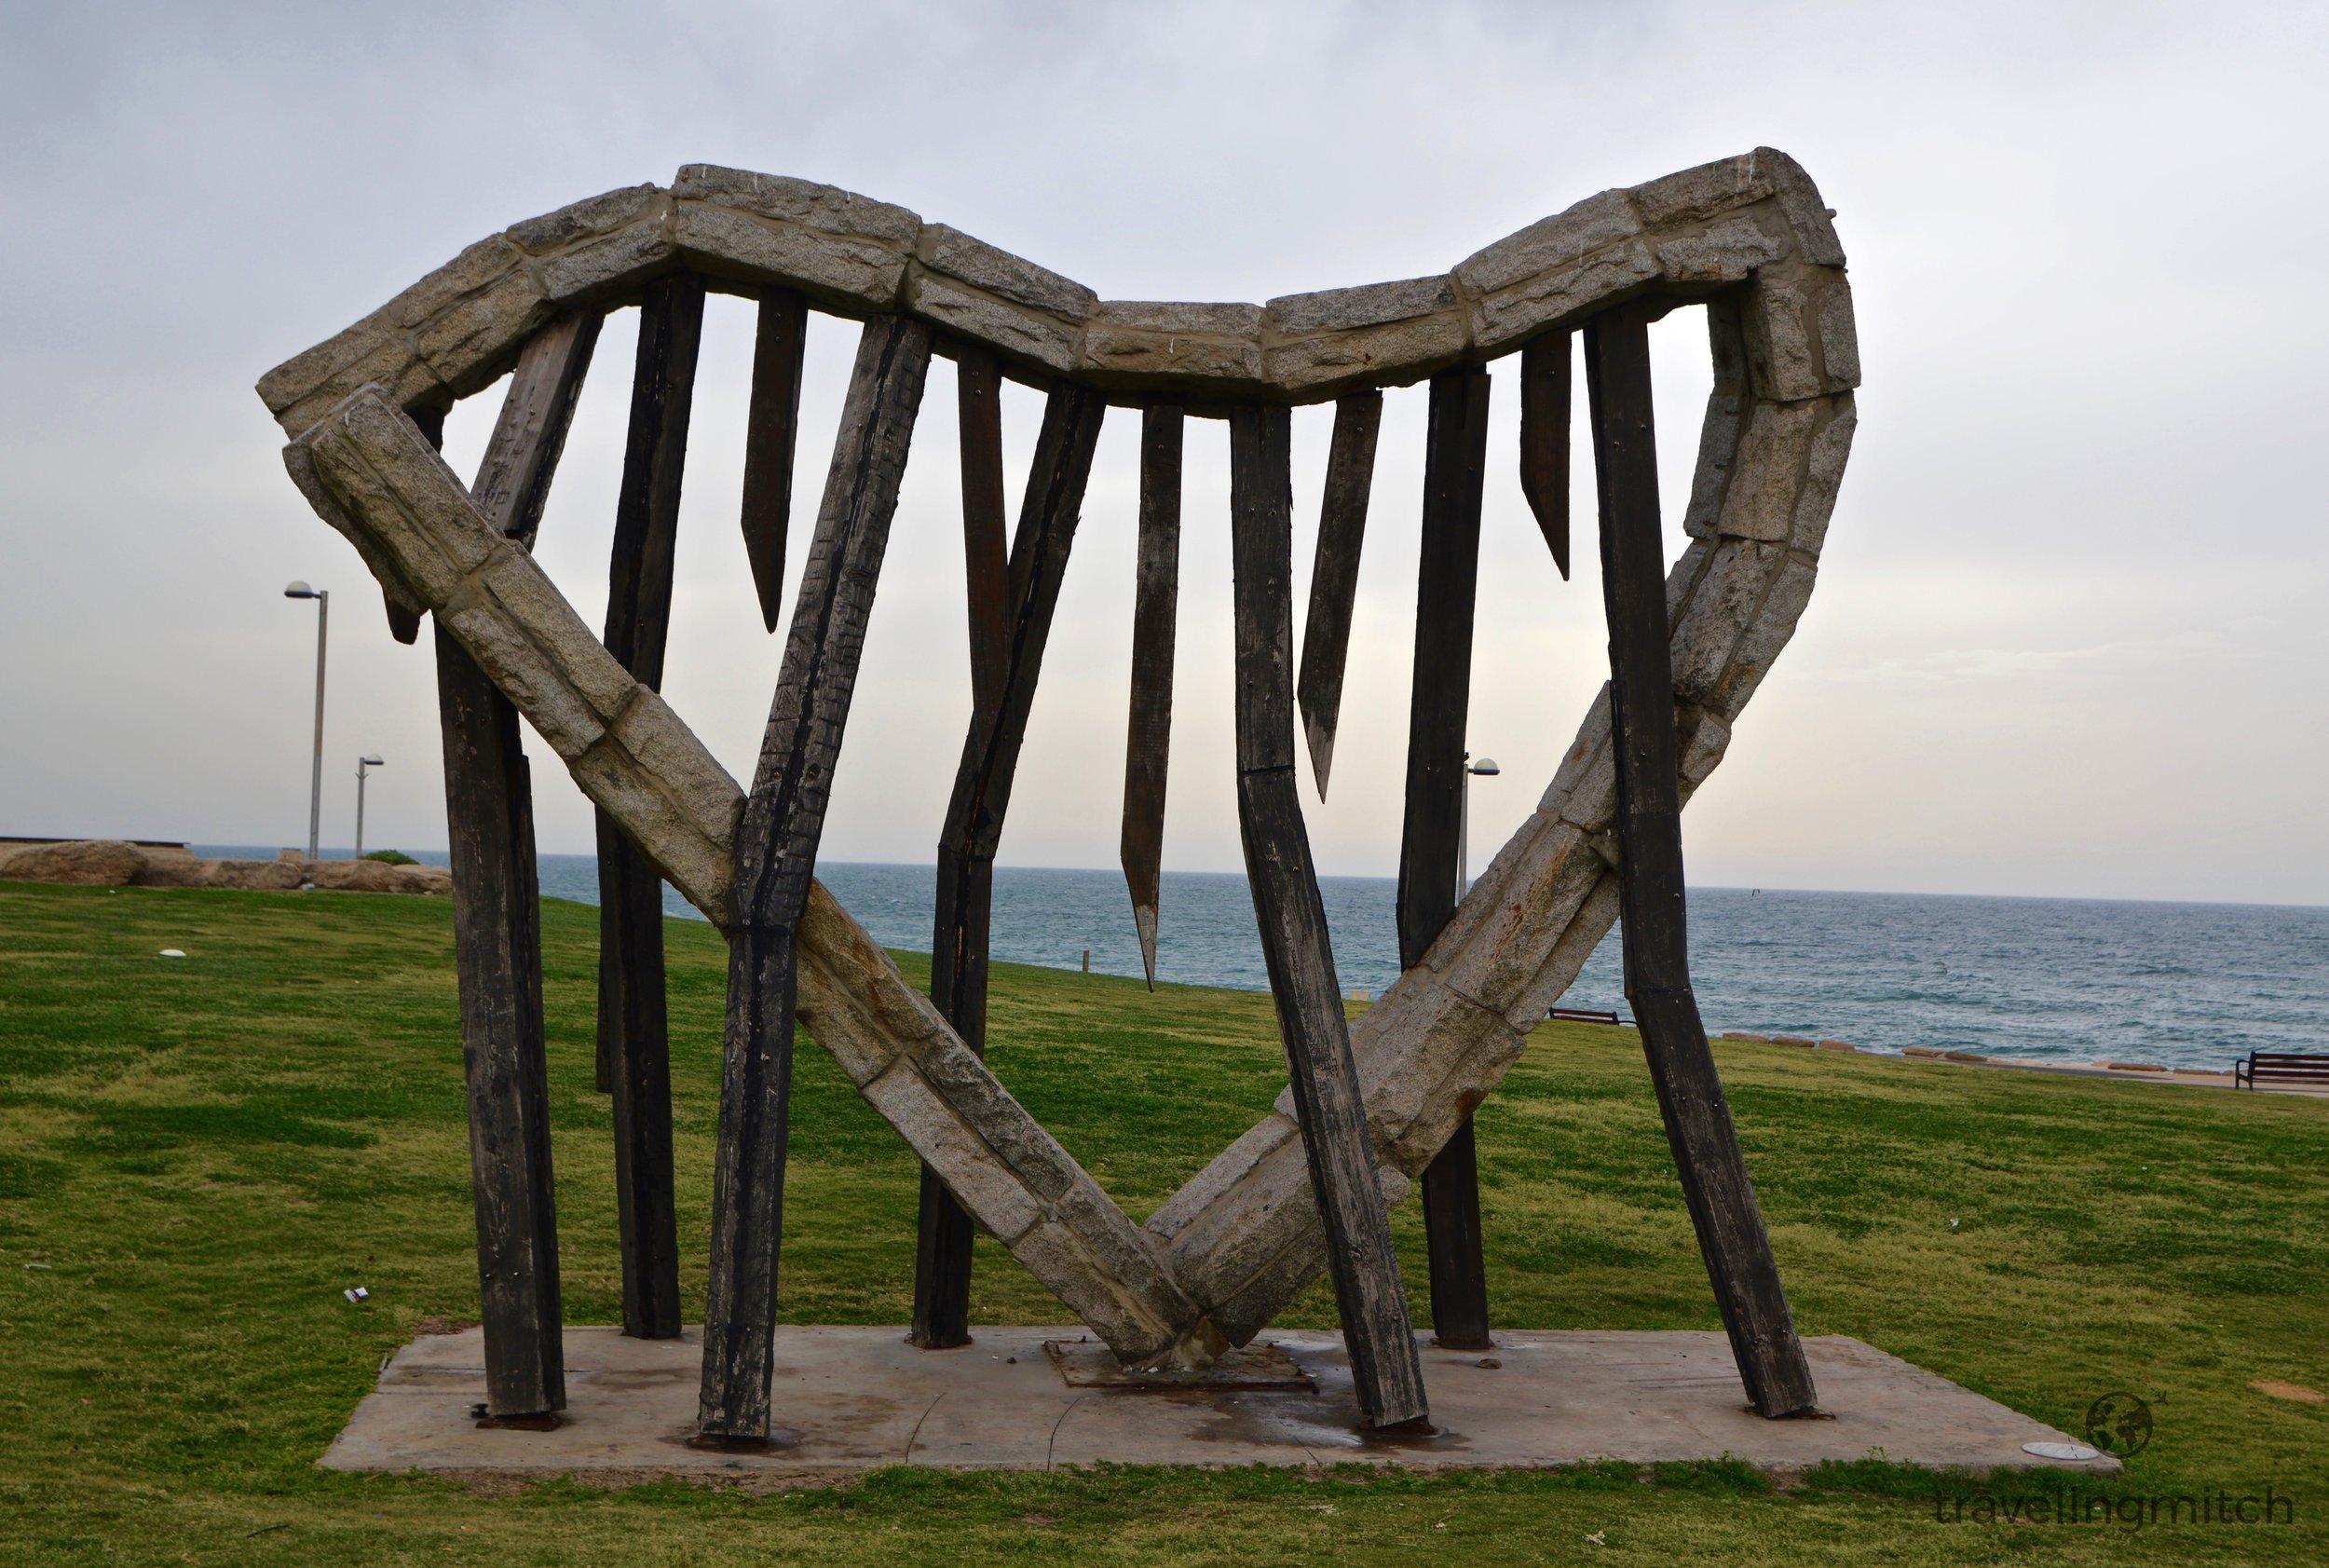 Charles Clore Park - Tel Aviv, Israel